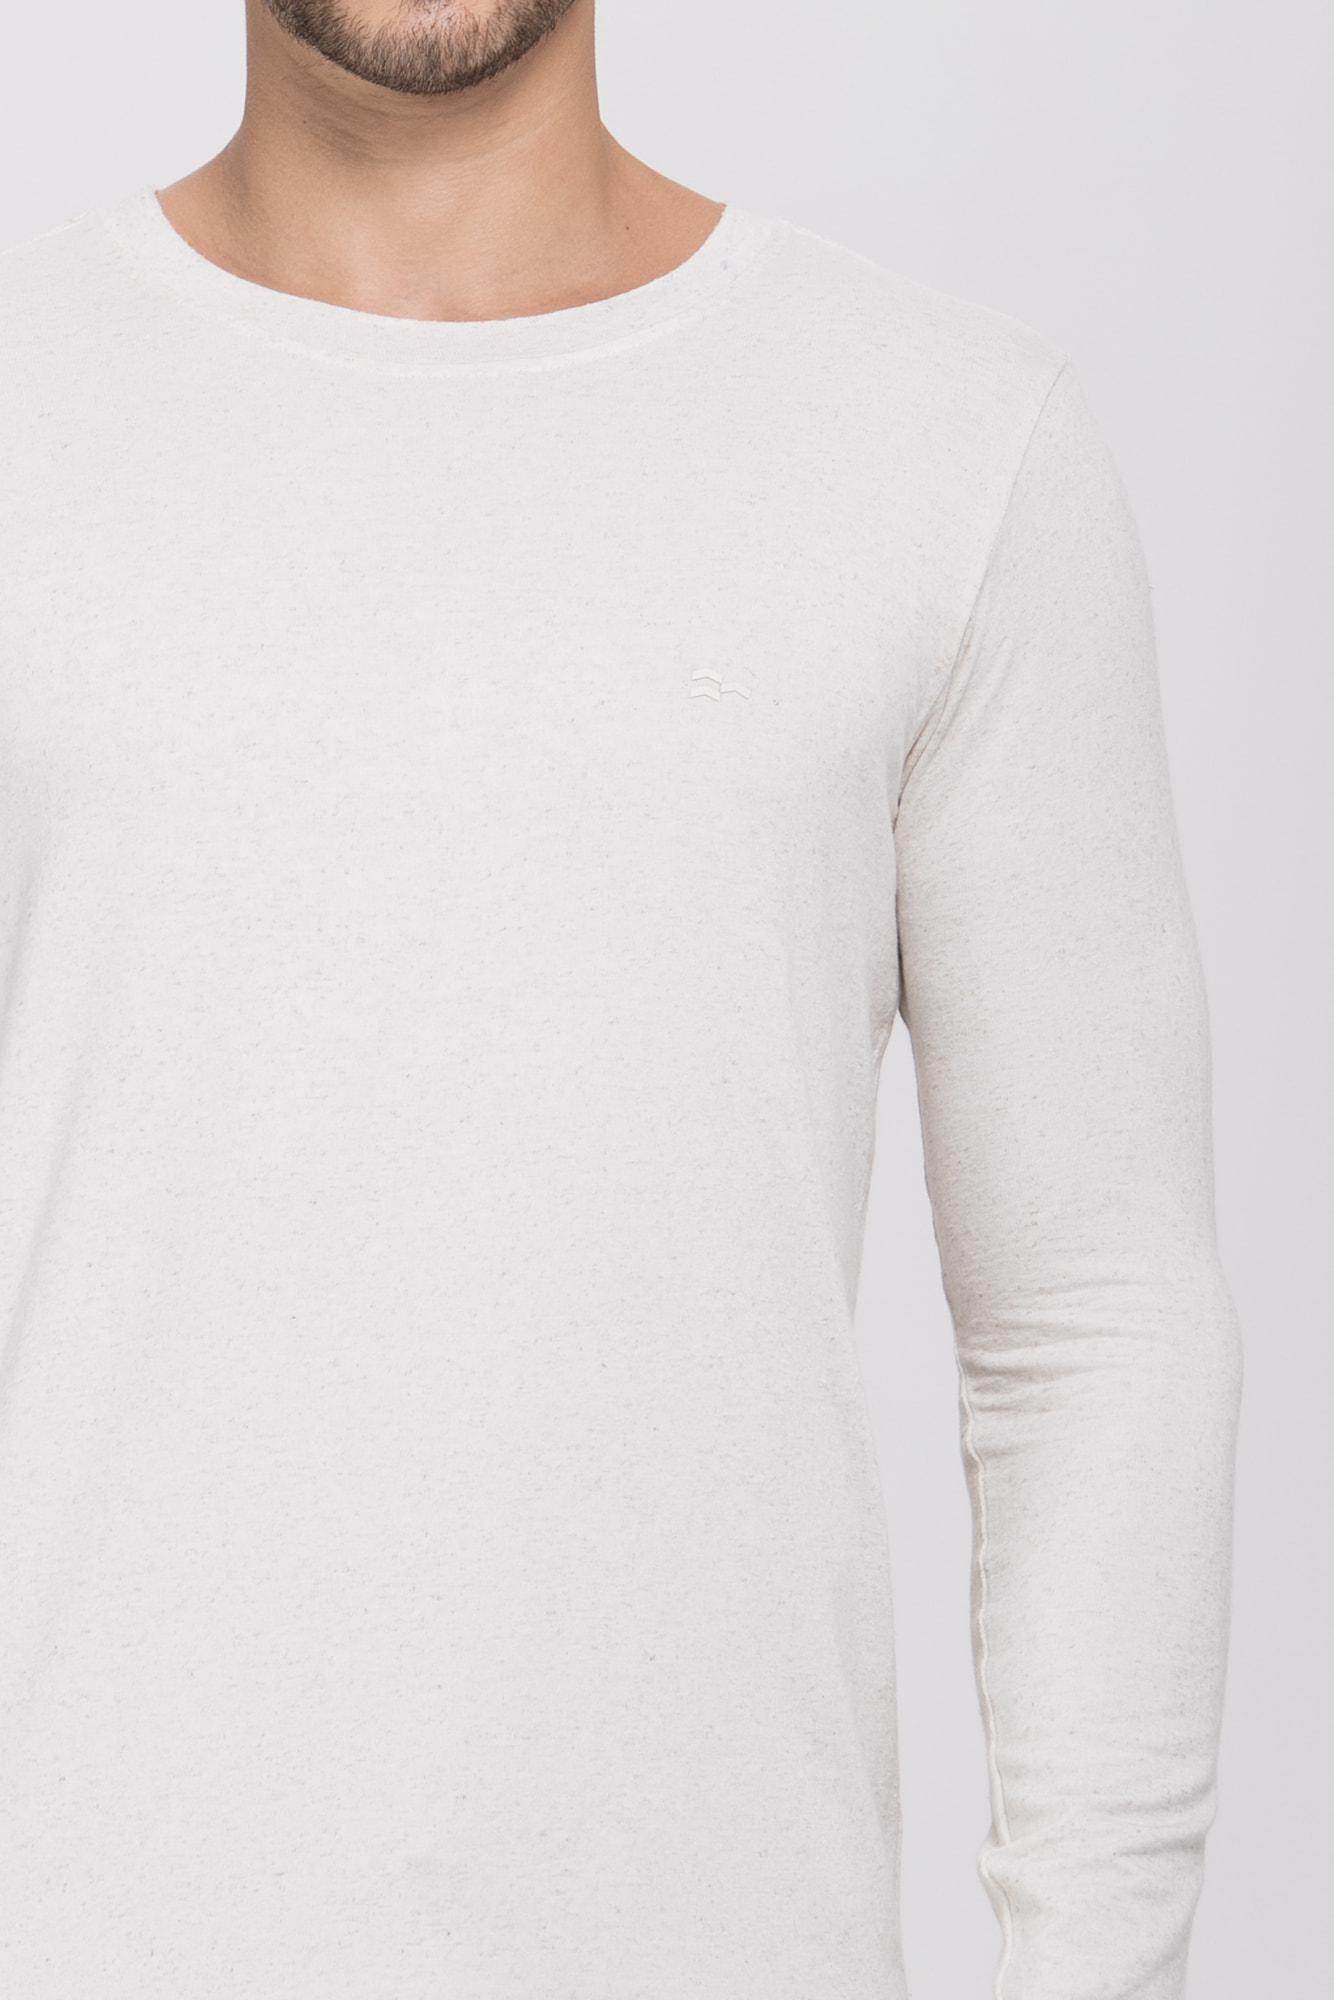 Camiseta ML Lino Natural